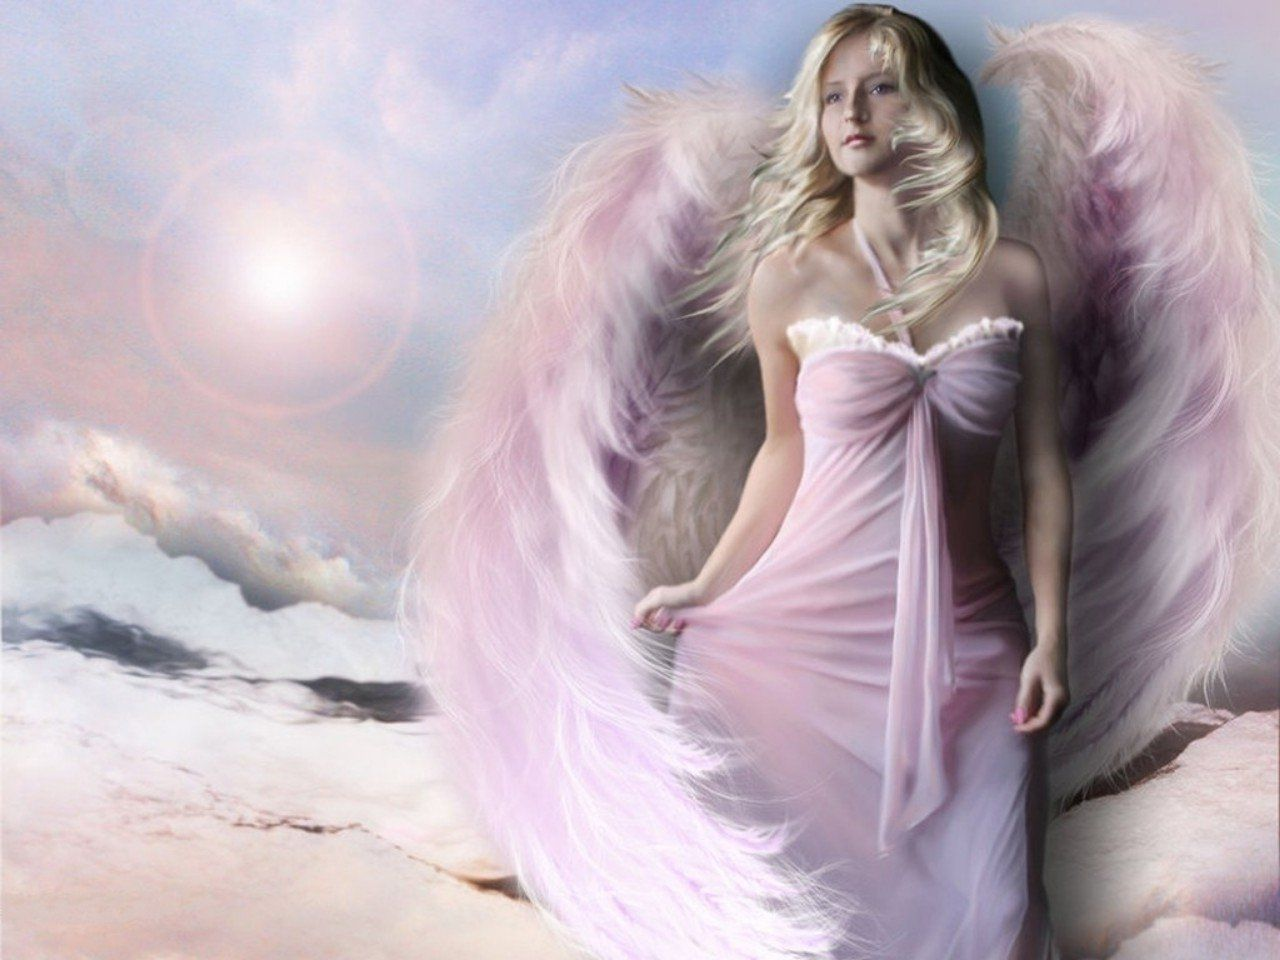 Free Angel Photos Download Google Search Angel Images Angel Illustration Angel Angel hd wallpaper download